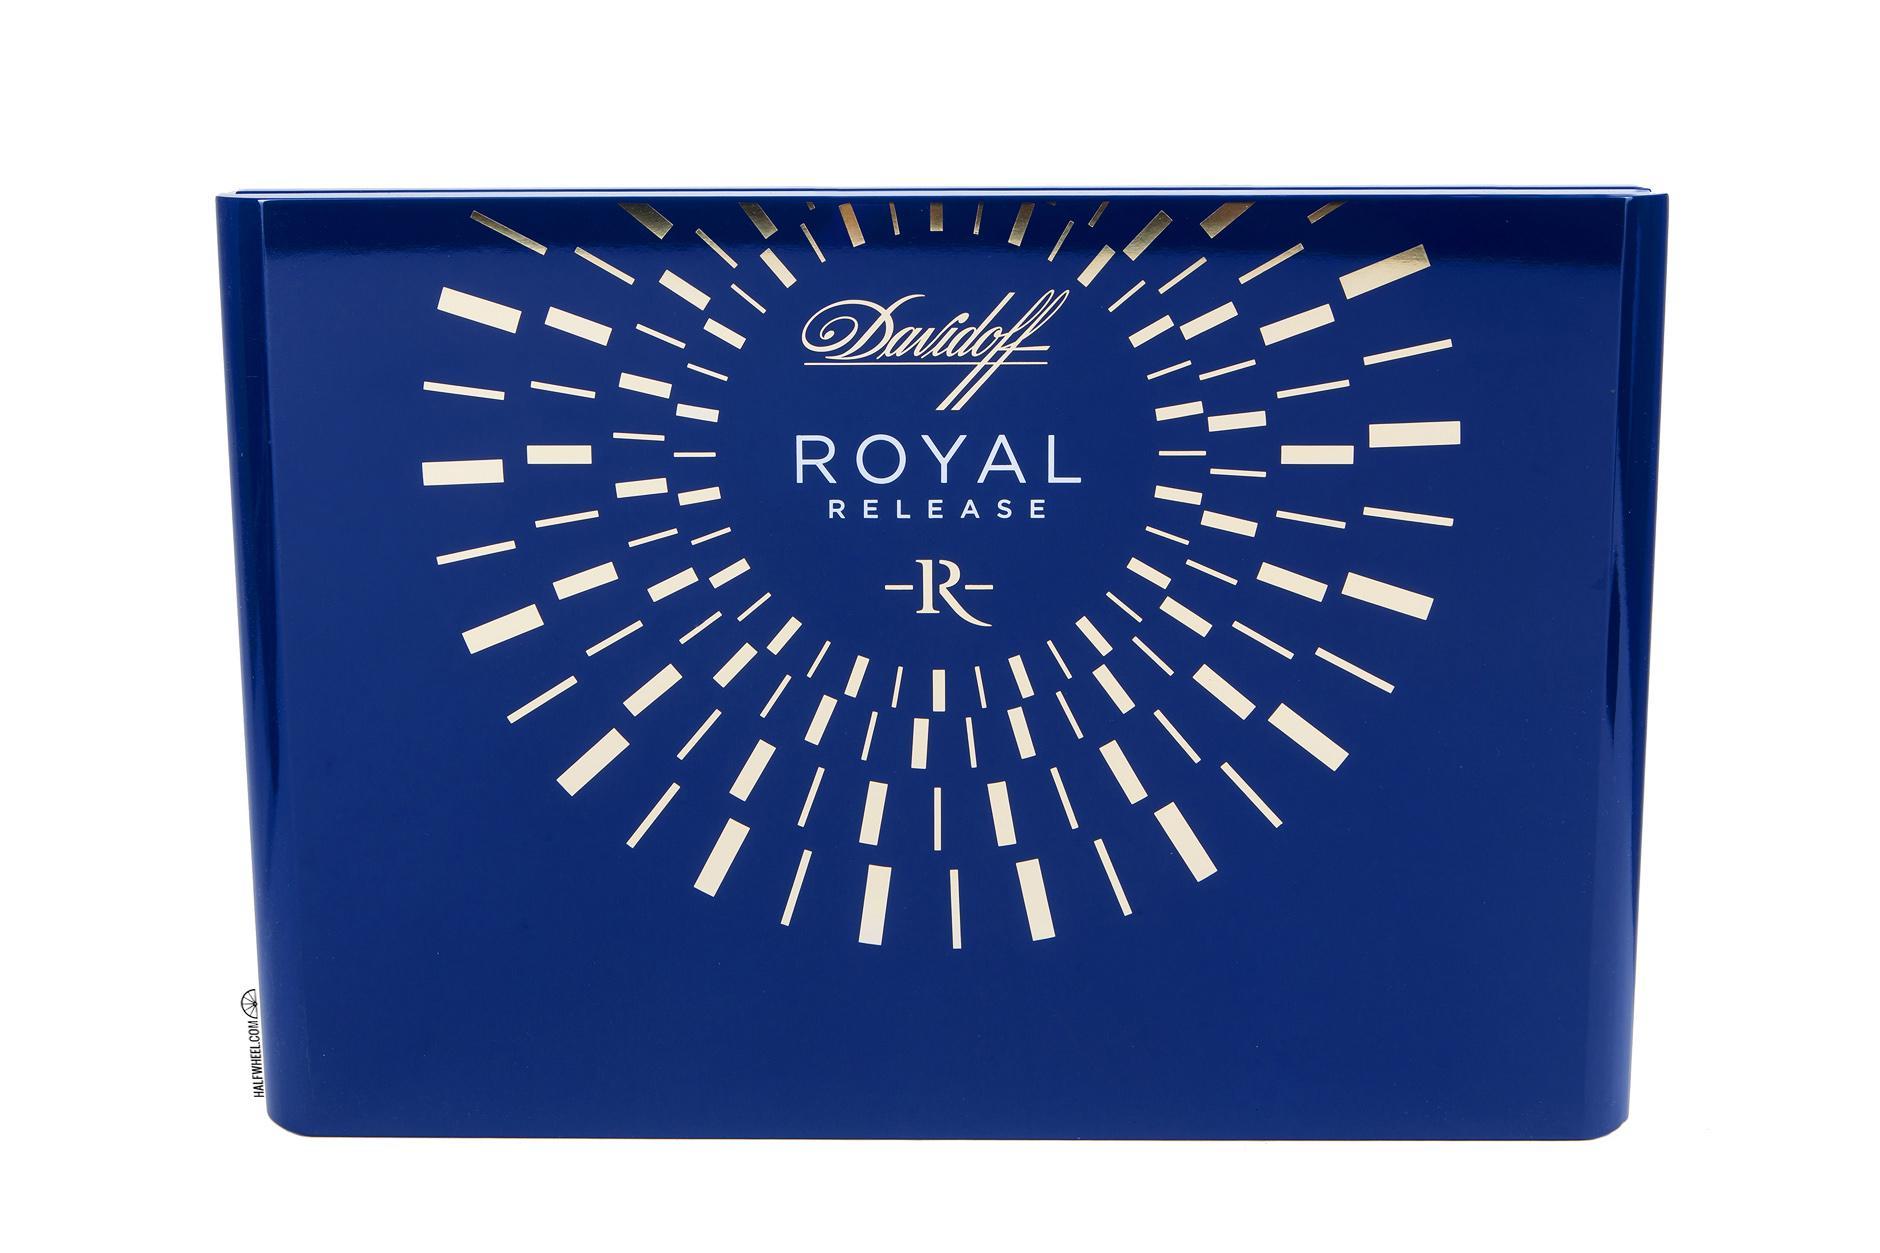 davidoff-royal-release-salomones-box-2